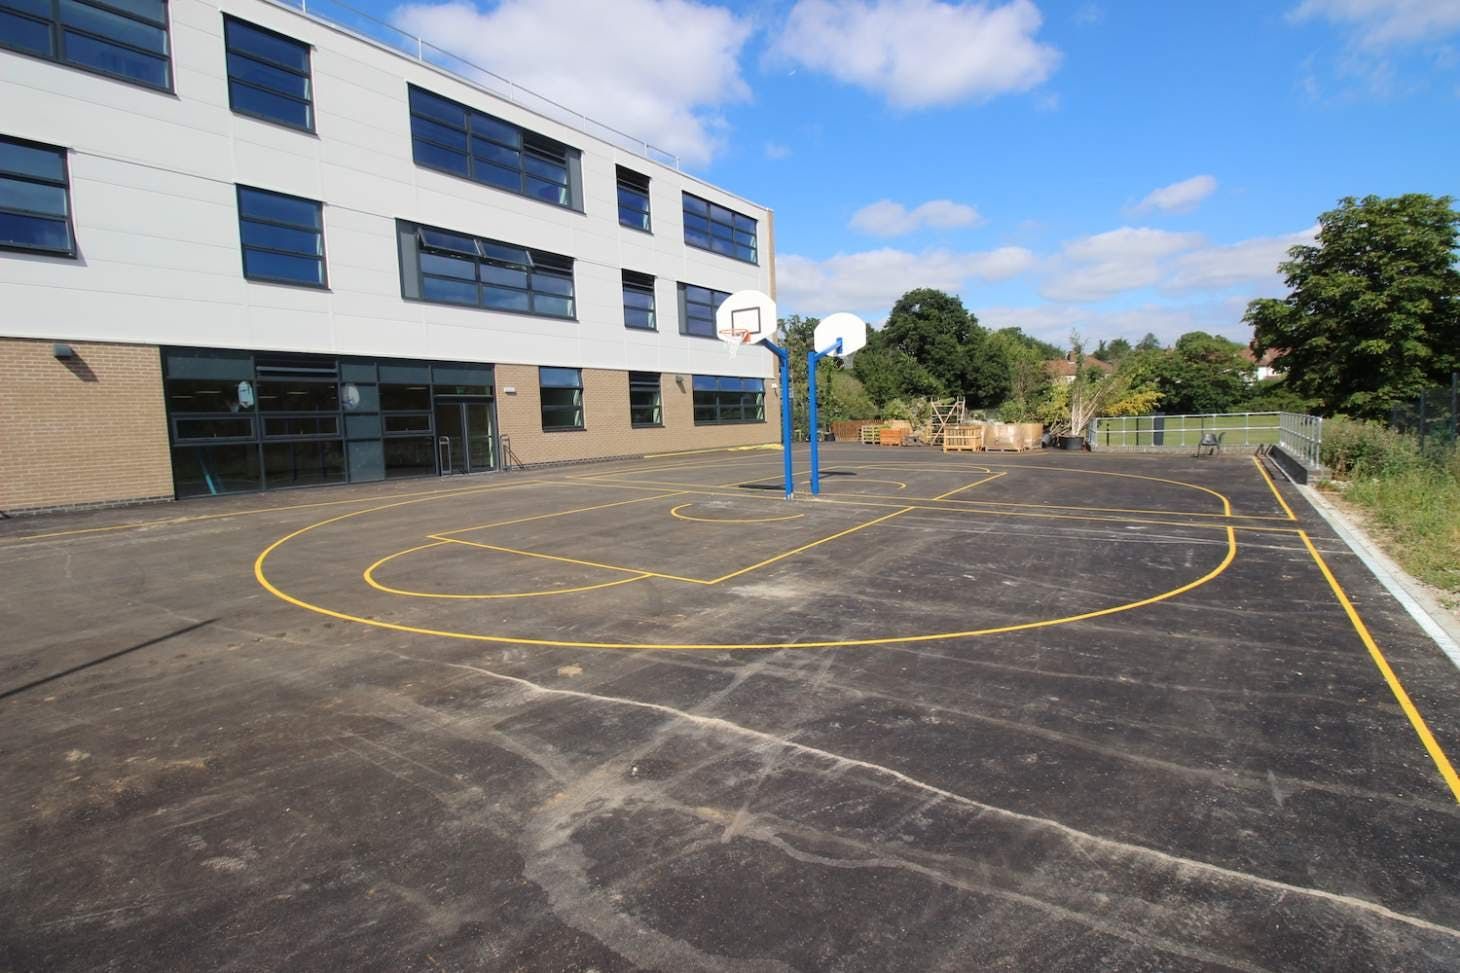 Ark Pioneer Academy Outdoor | Hard (macadam) basketball court